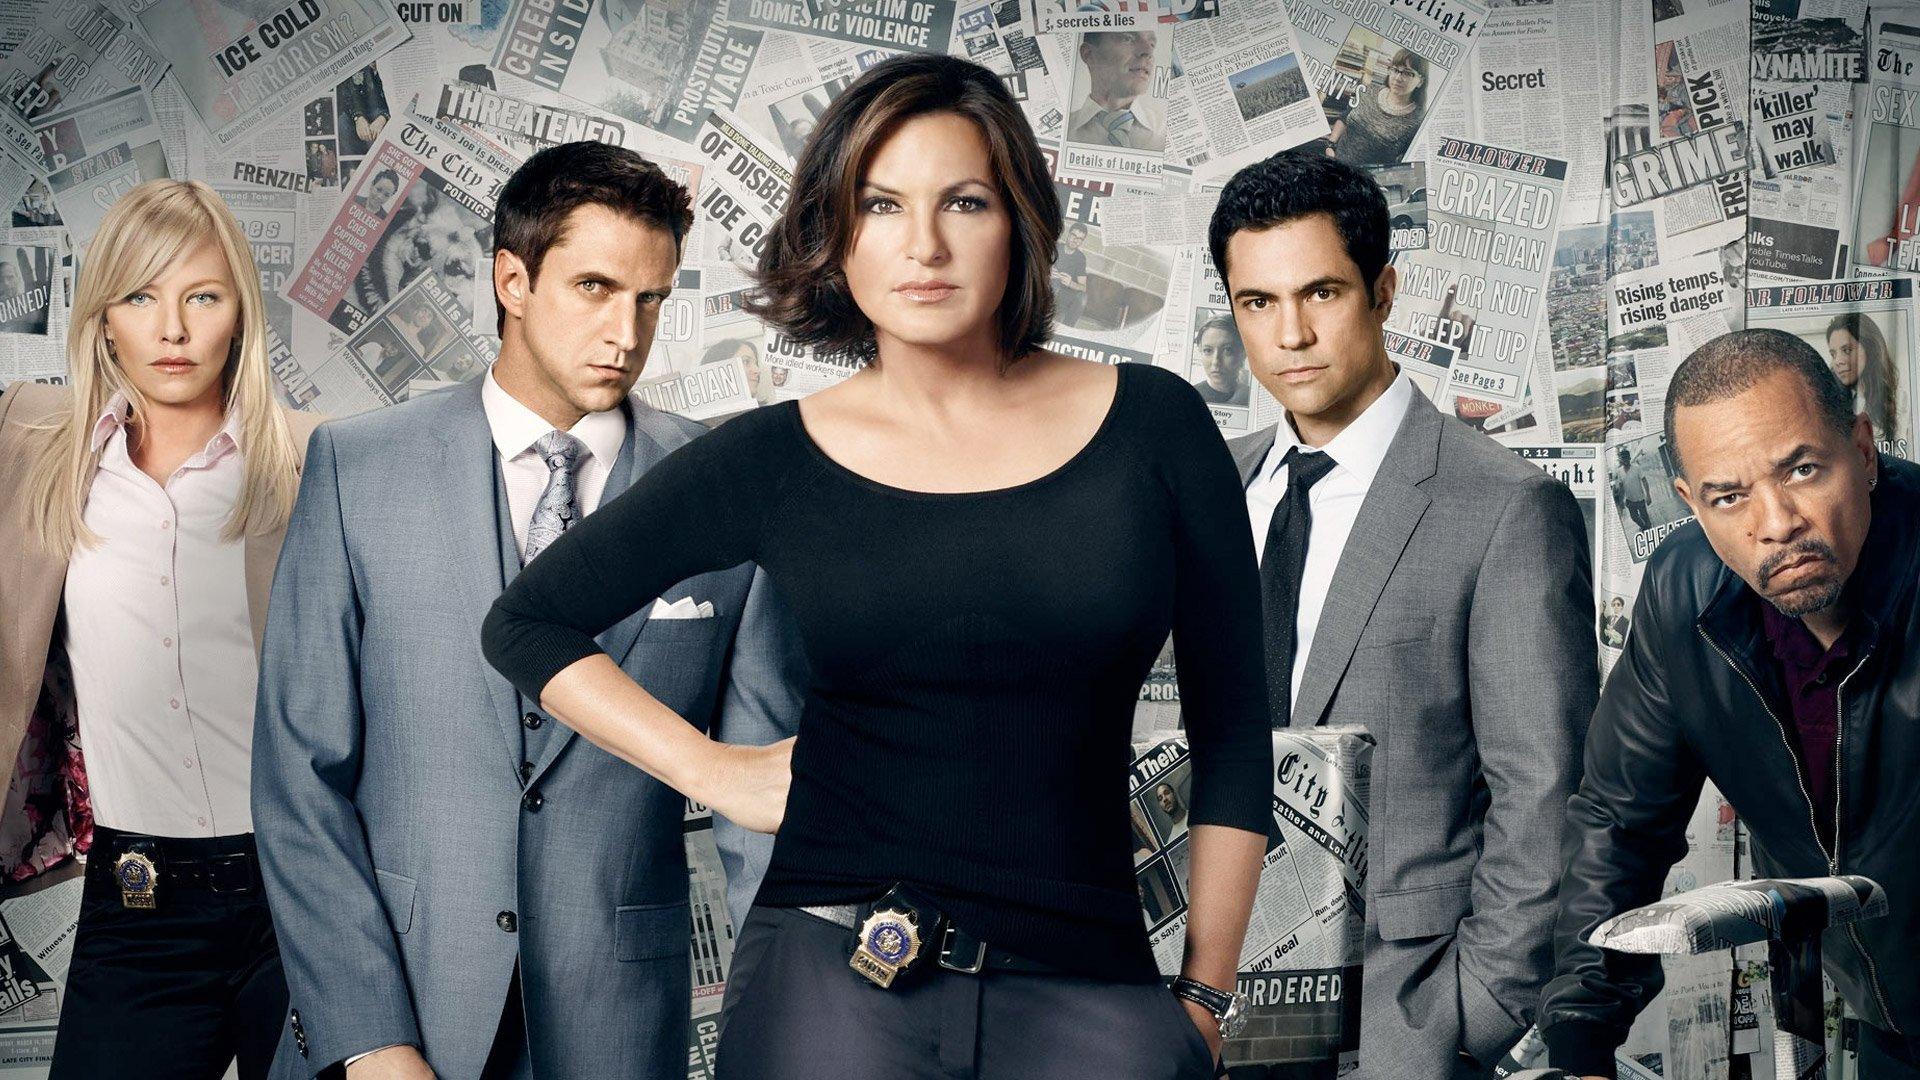 Subscribercast #43 – Media Breakdown: Hollywood and Copaganda